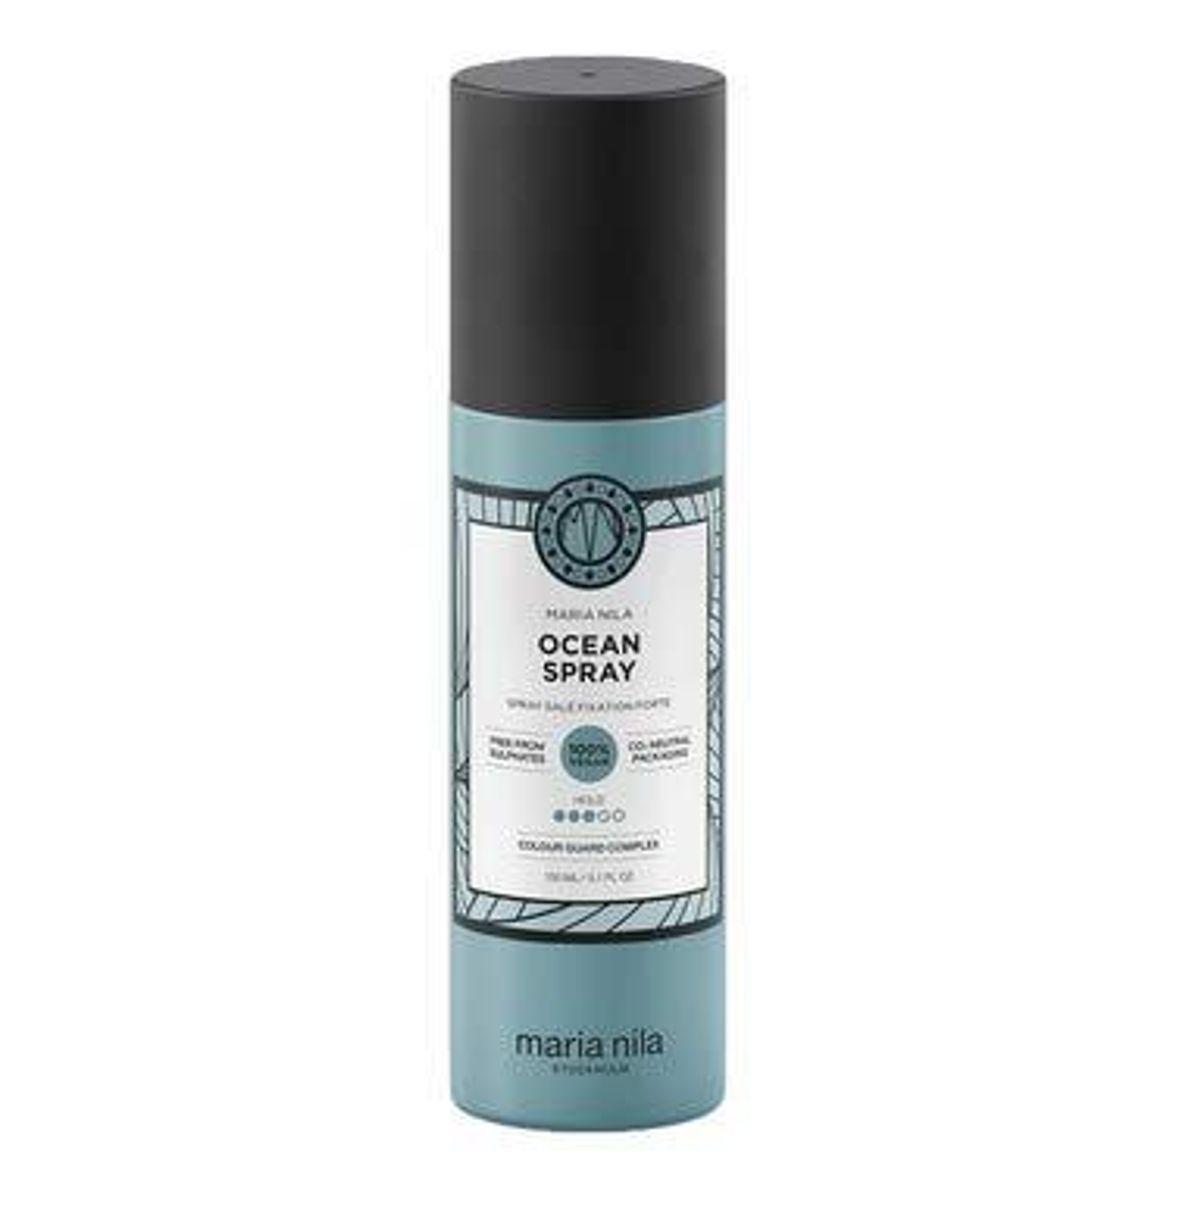 Ocean Spray 150 ml